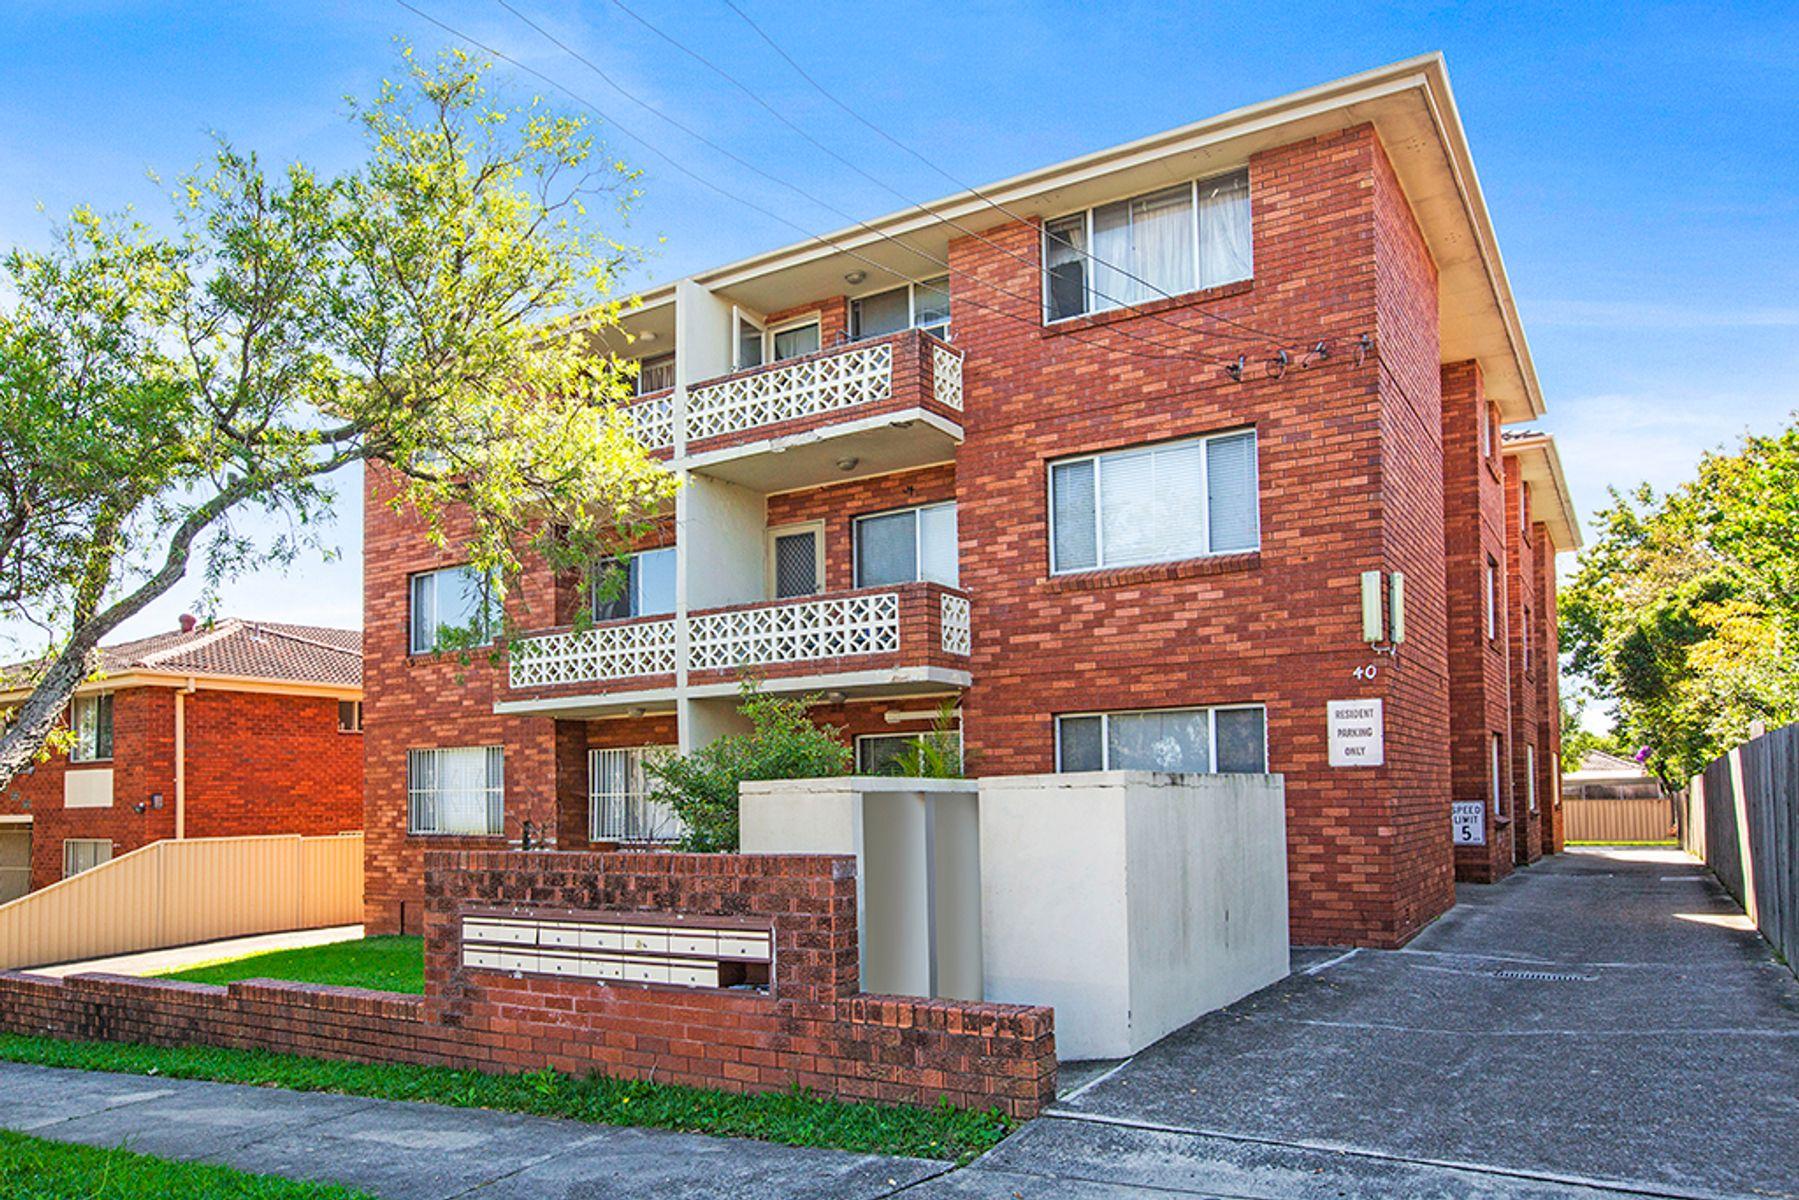 6/40 Anderson Street, Belmore, NSW 2192